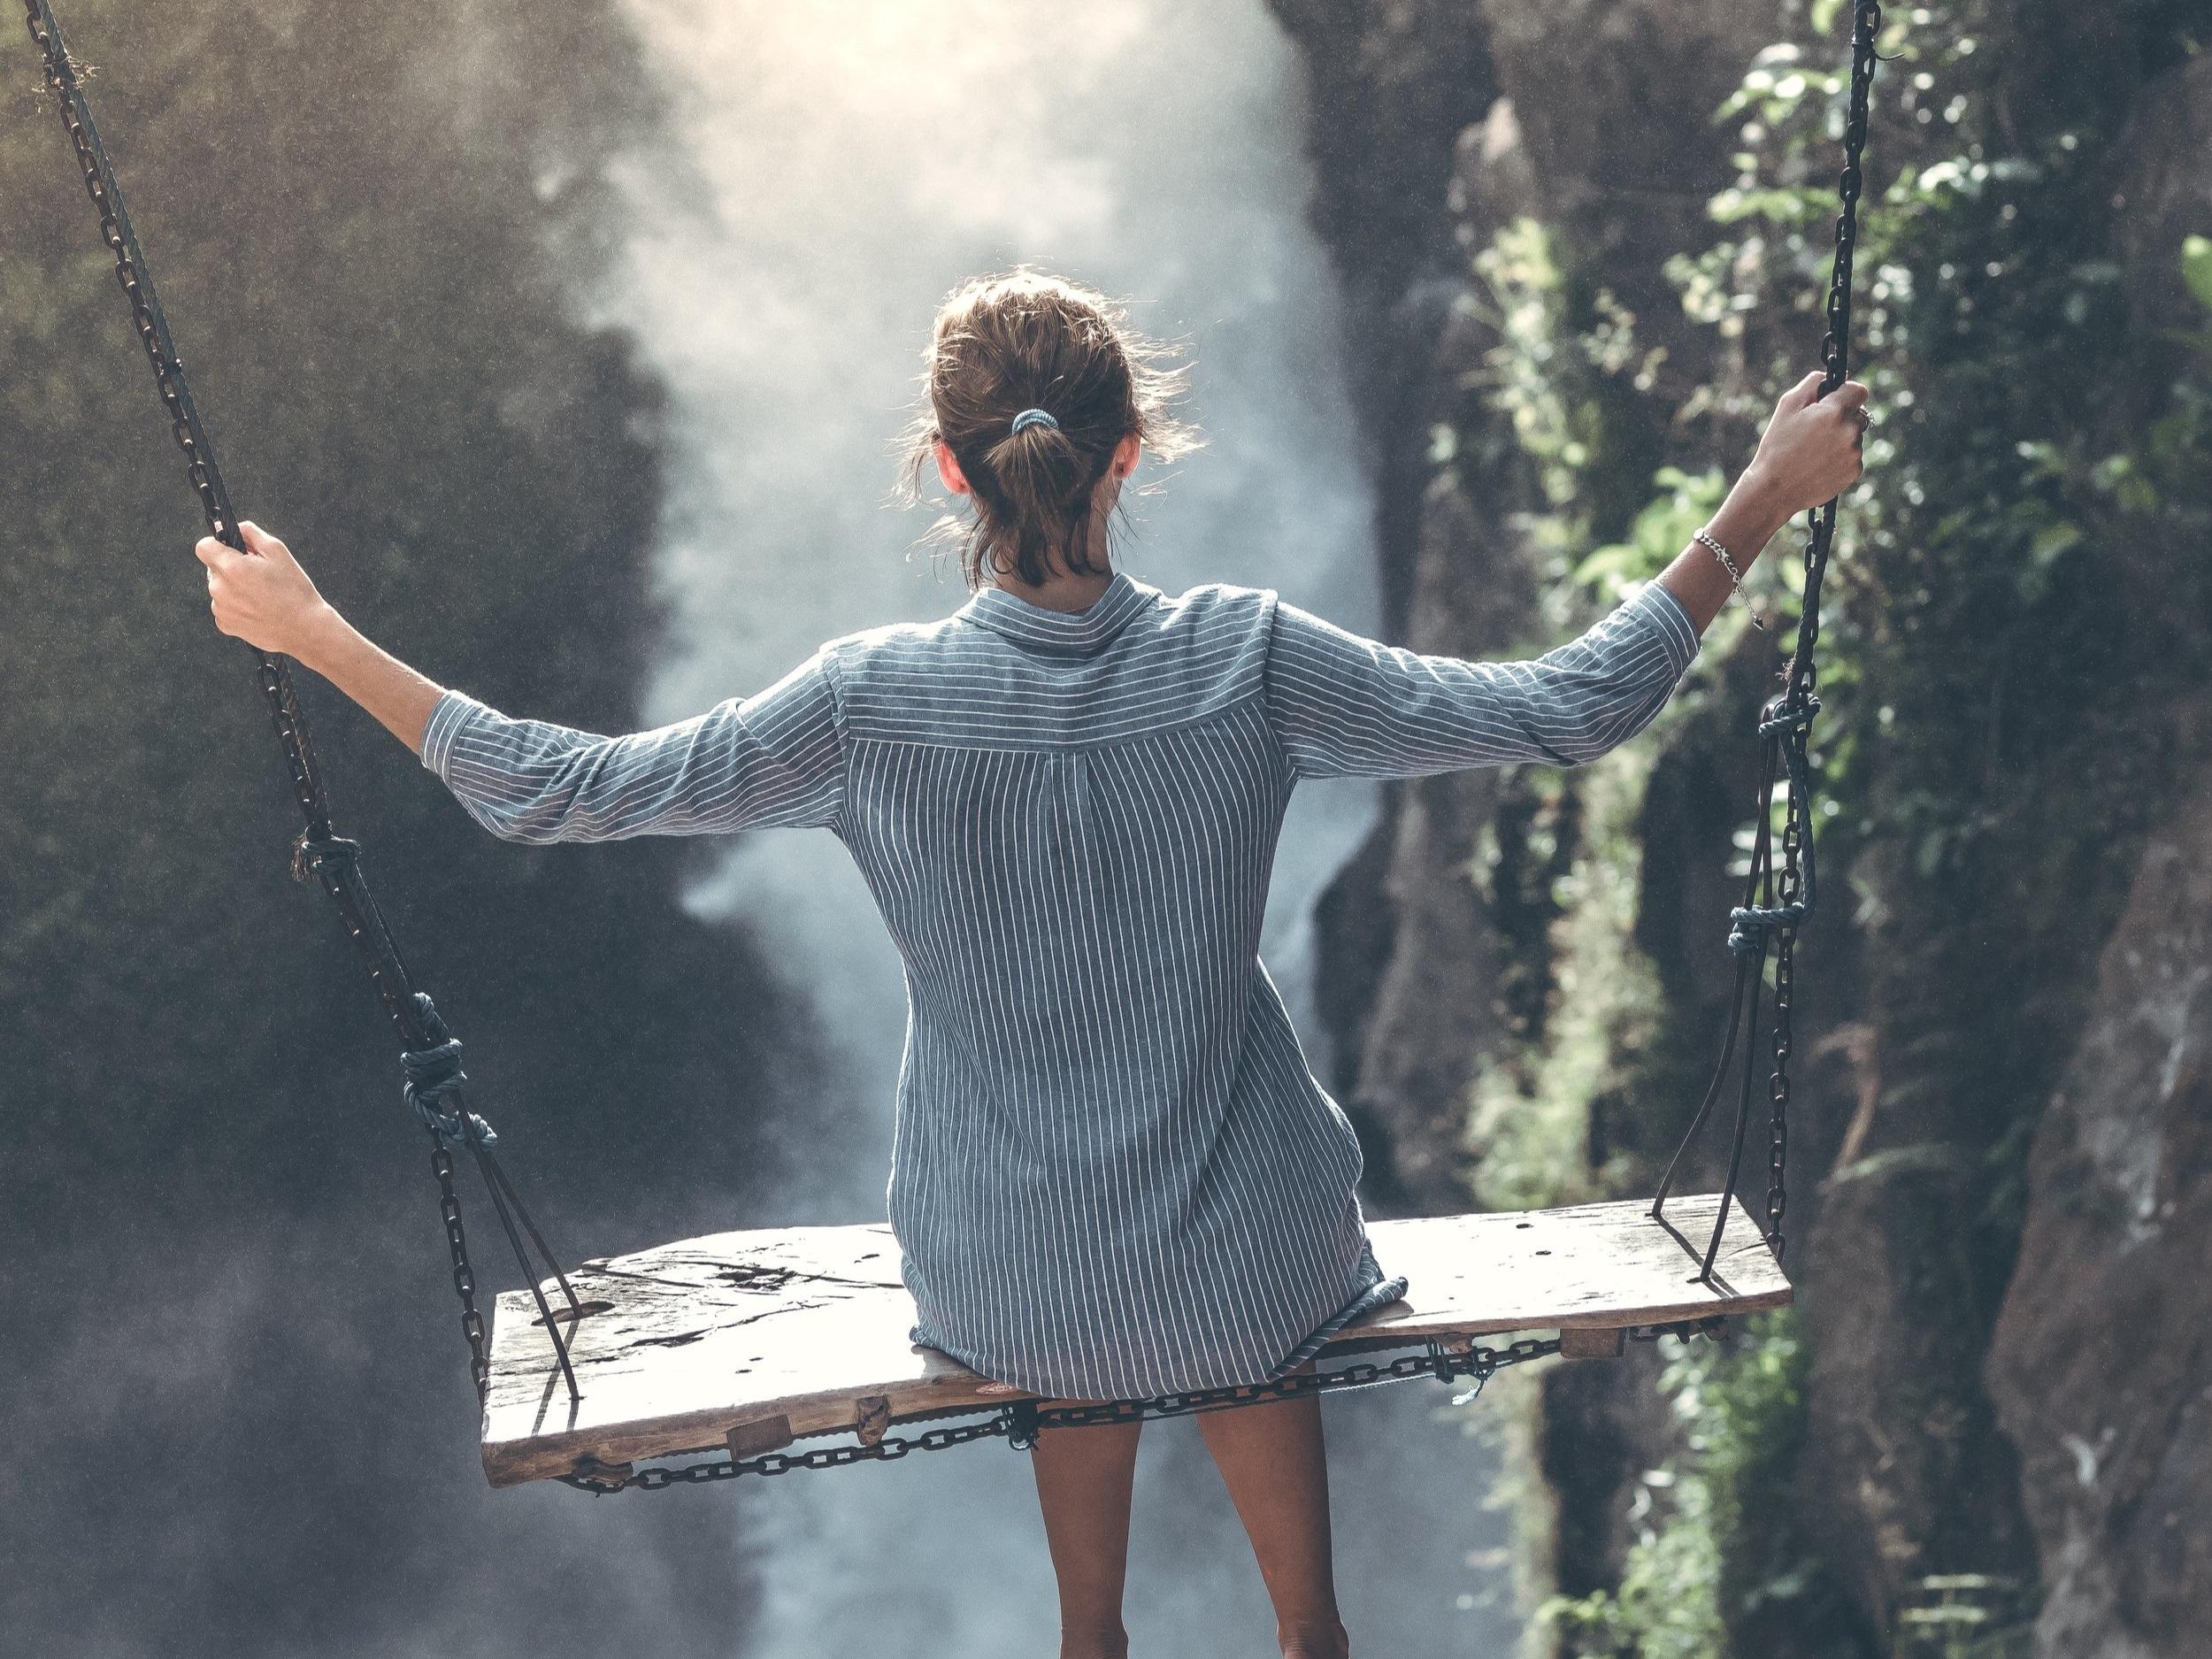 adventurous+spirit.jpg